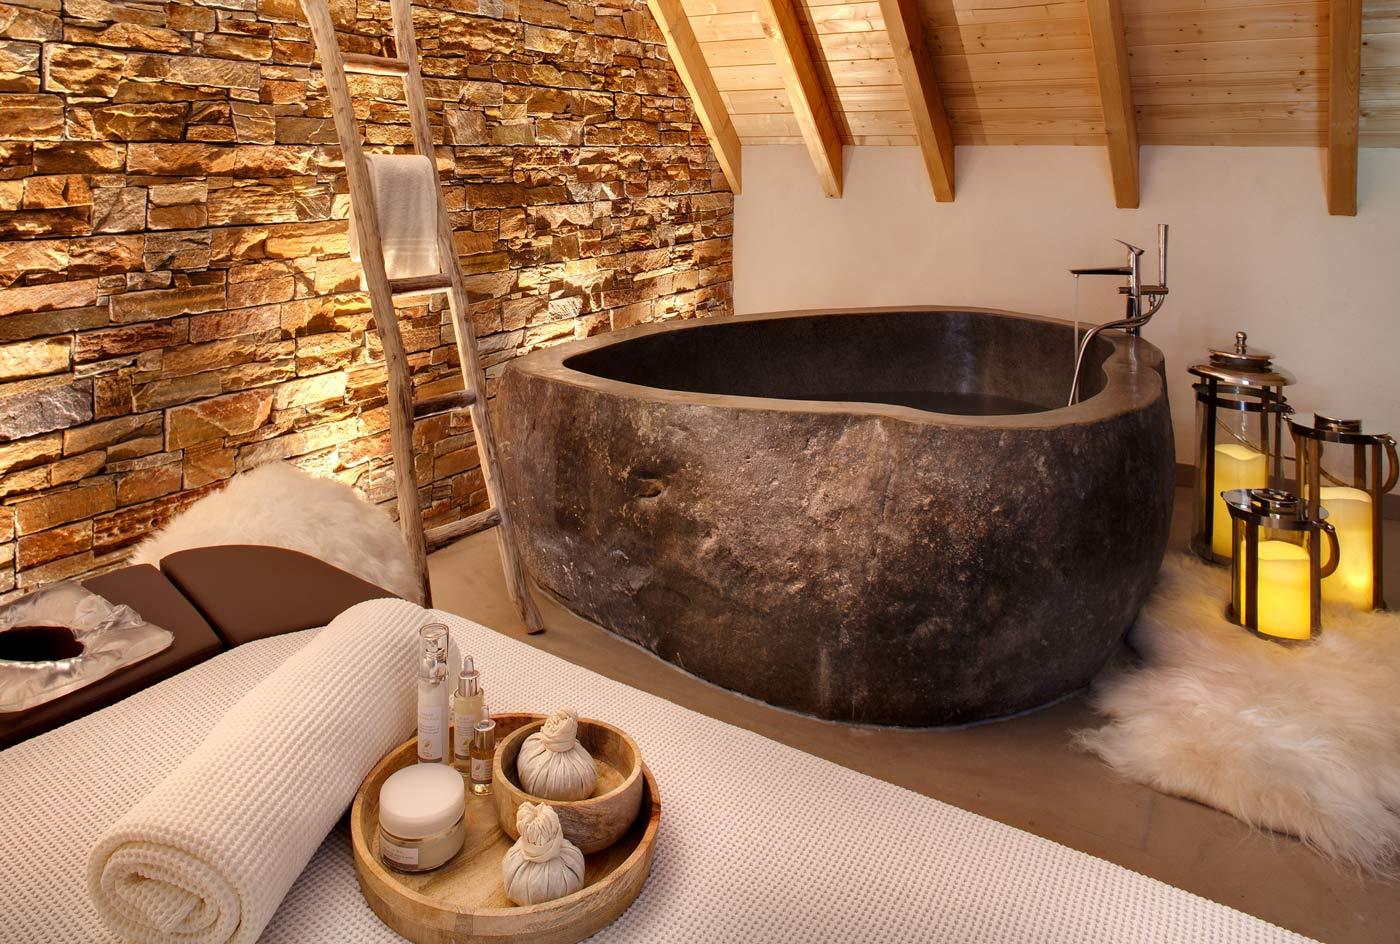 Meilleur spa d h tel en europe alsace welcome for Designhotel elsass